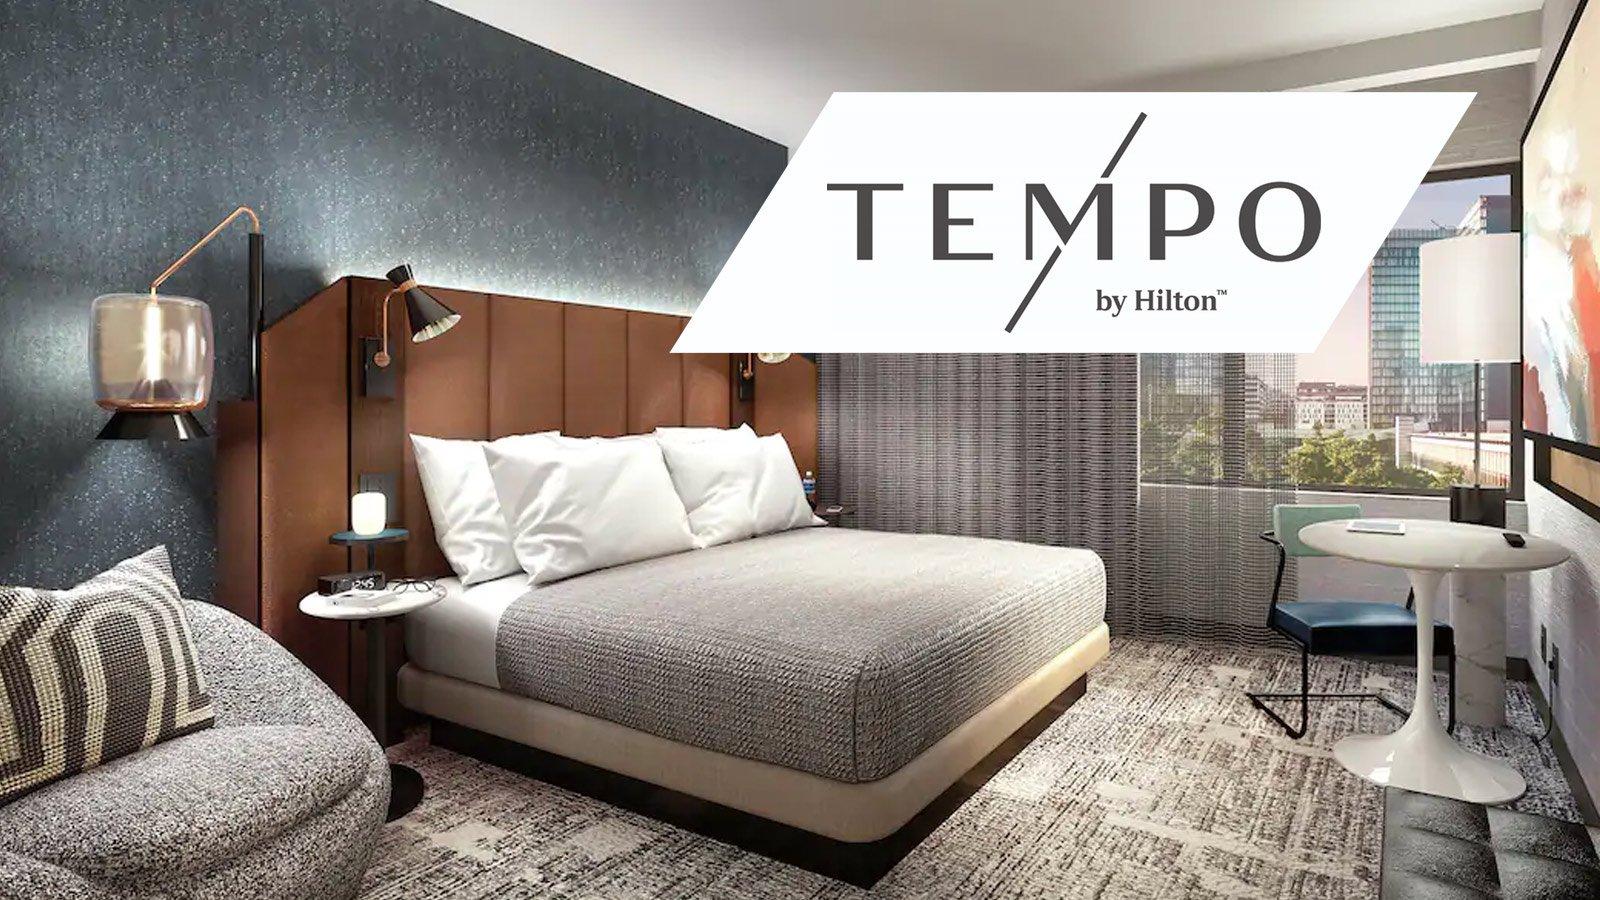 Tempo Hilton hotel room